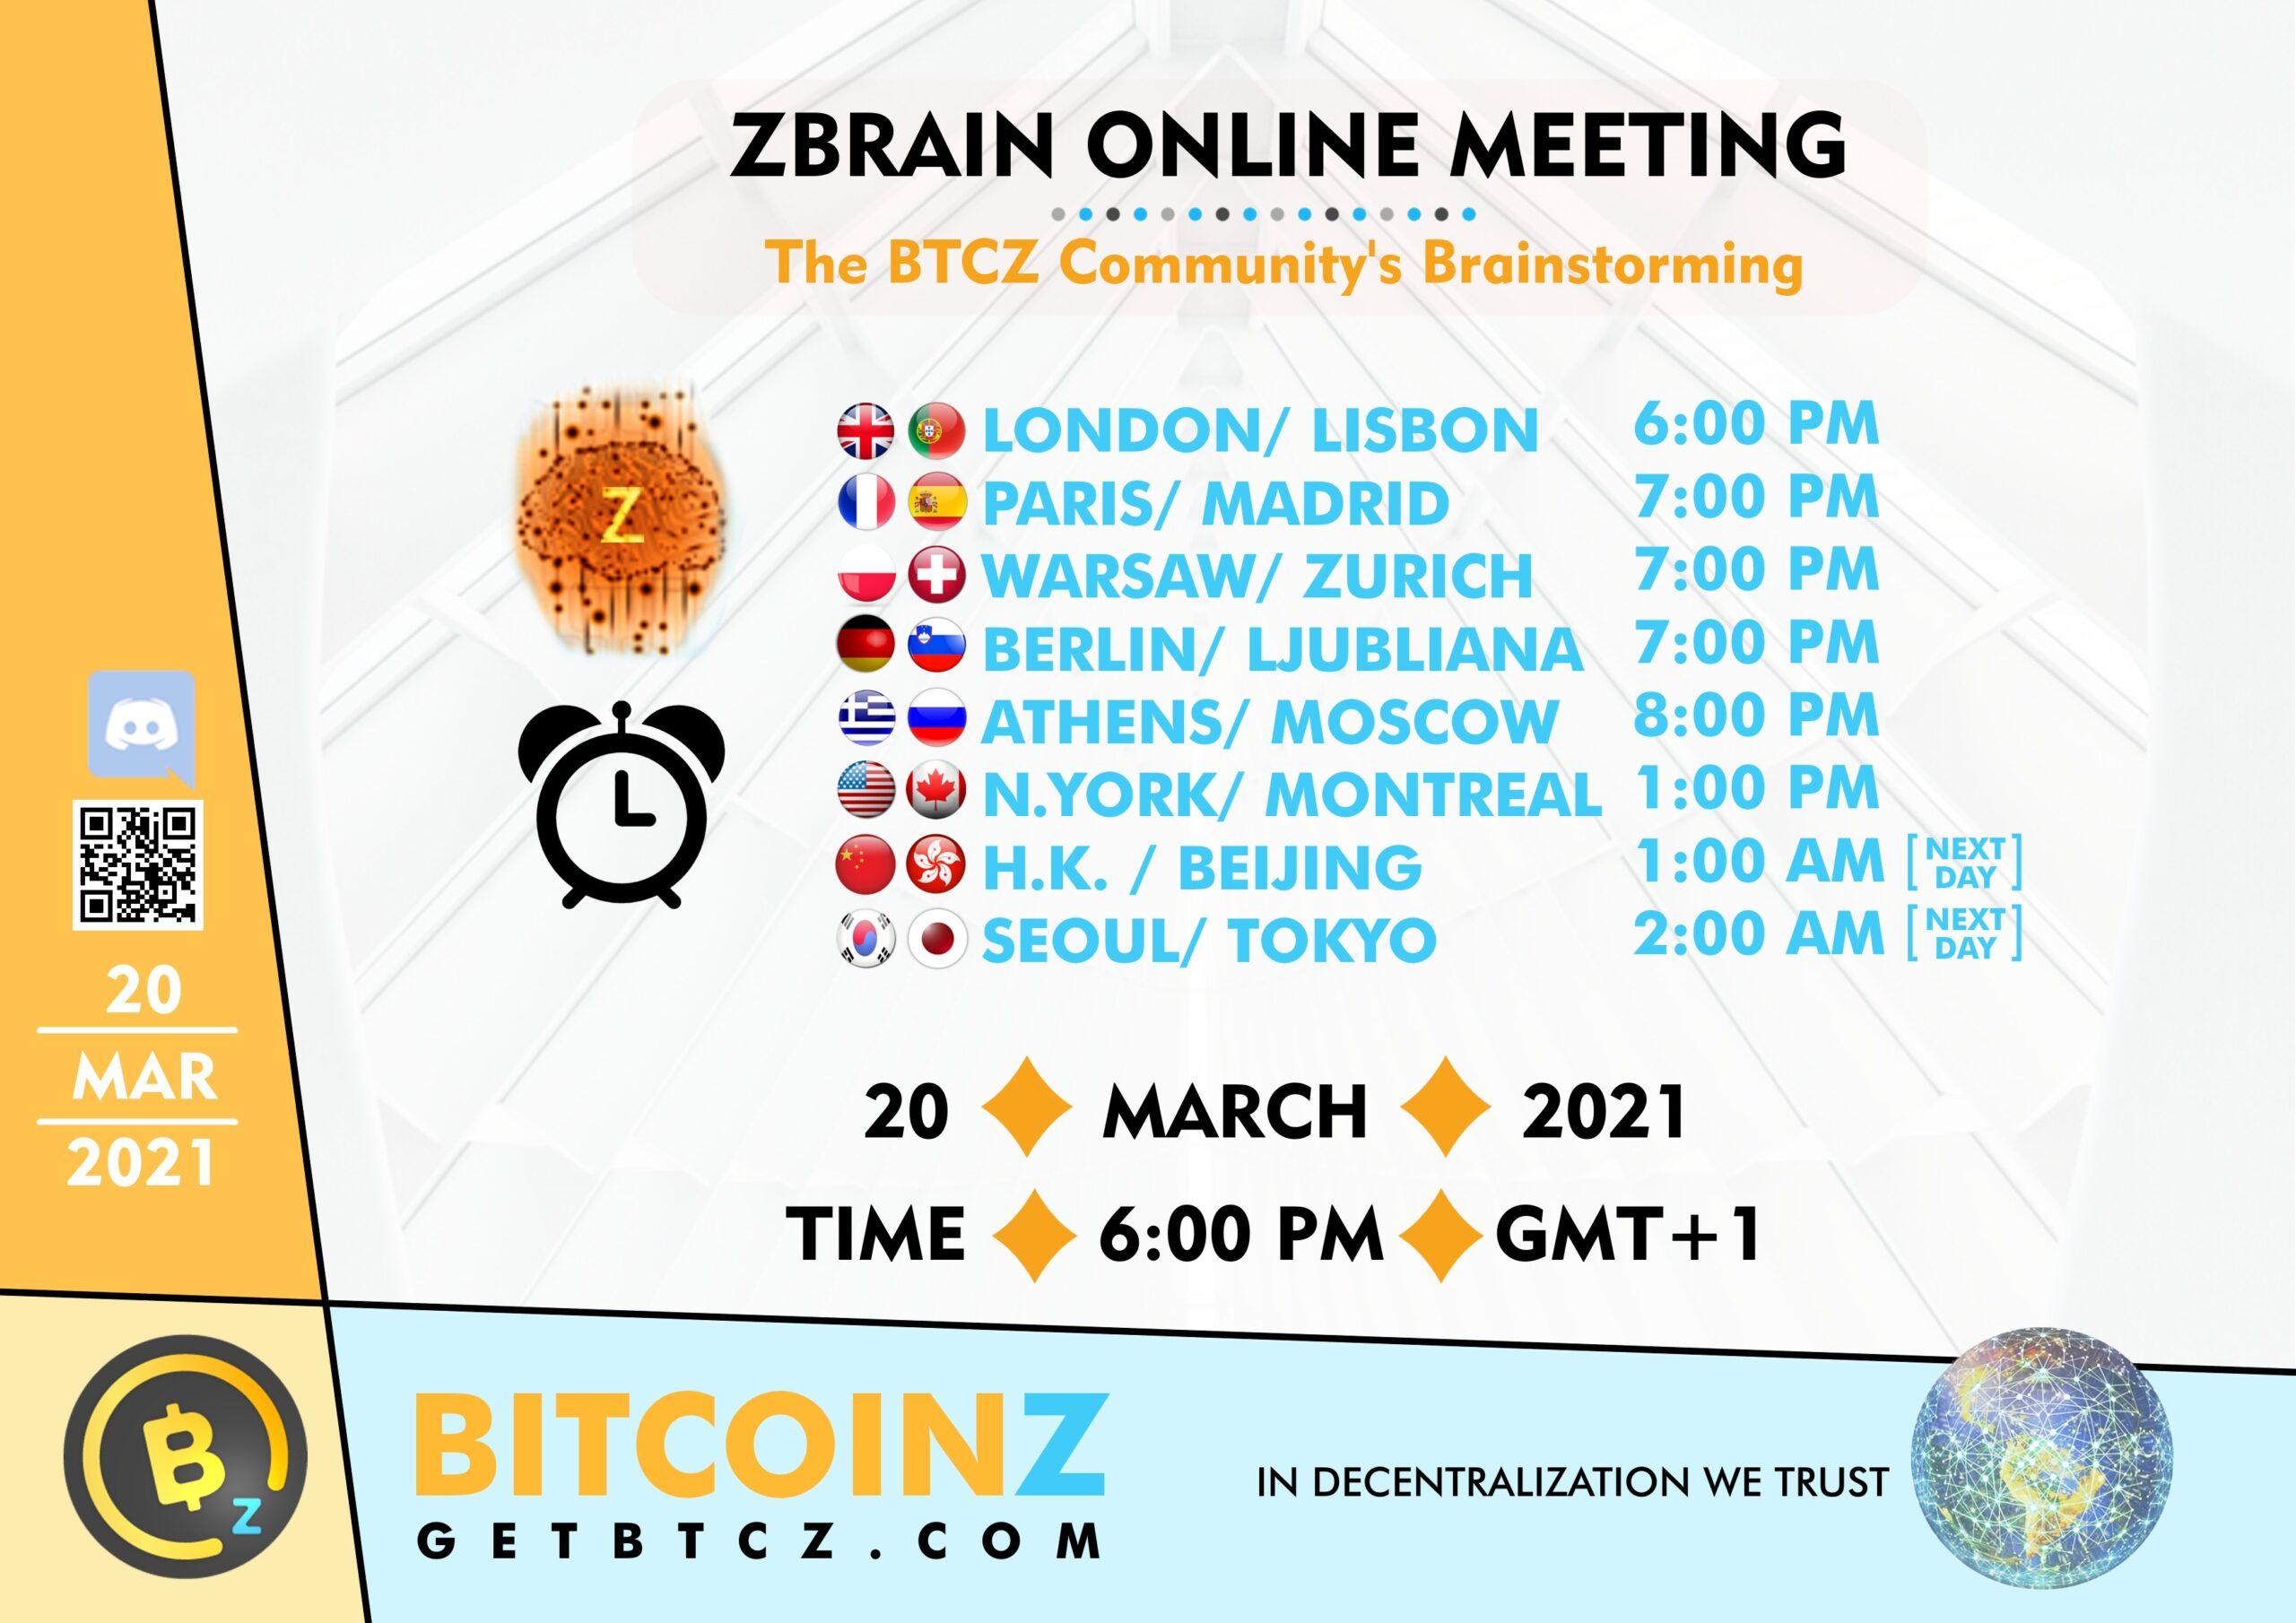 Z-Brain 20 March 2021